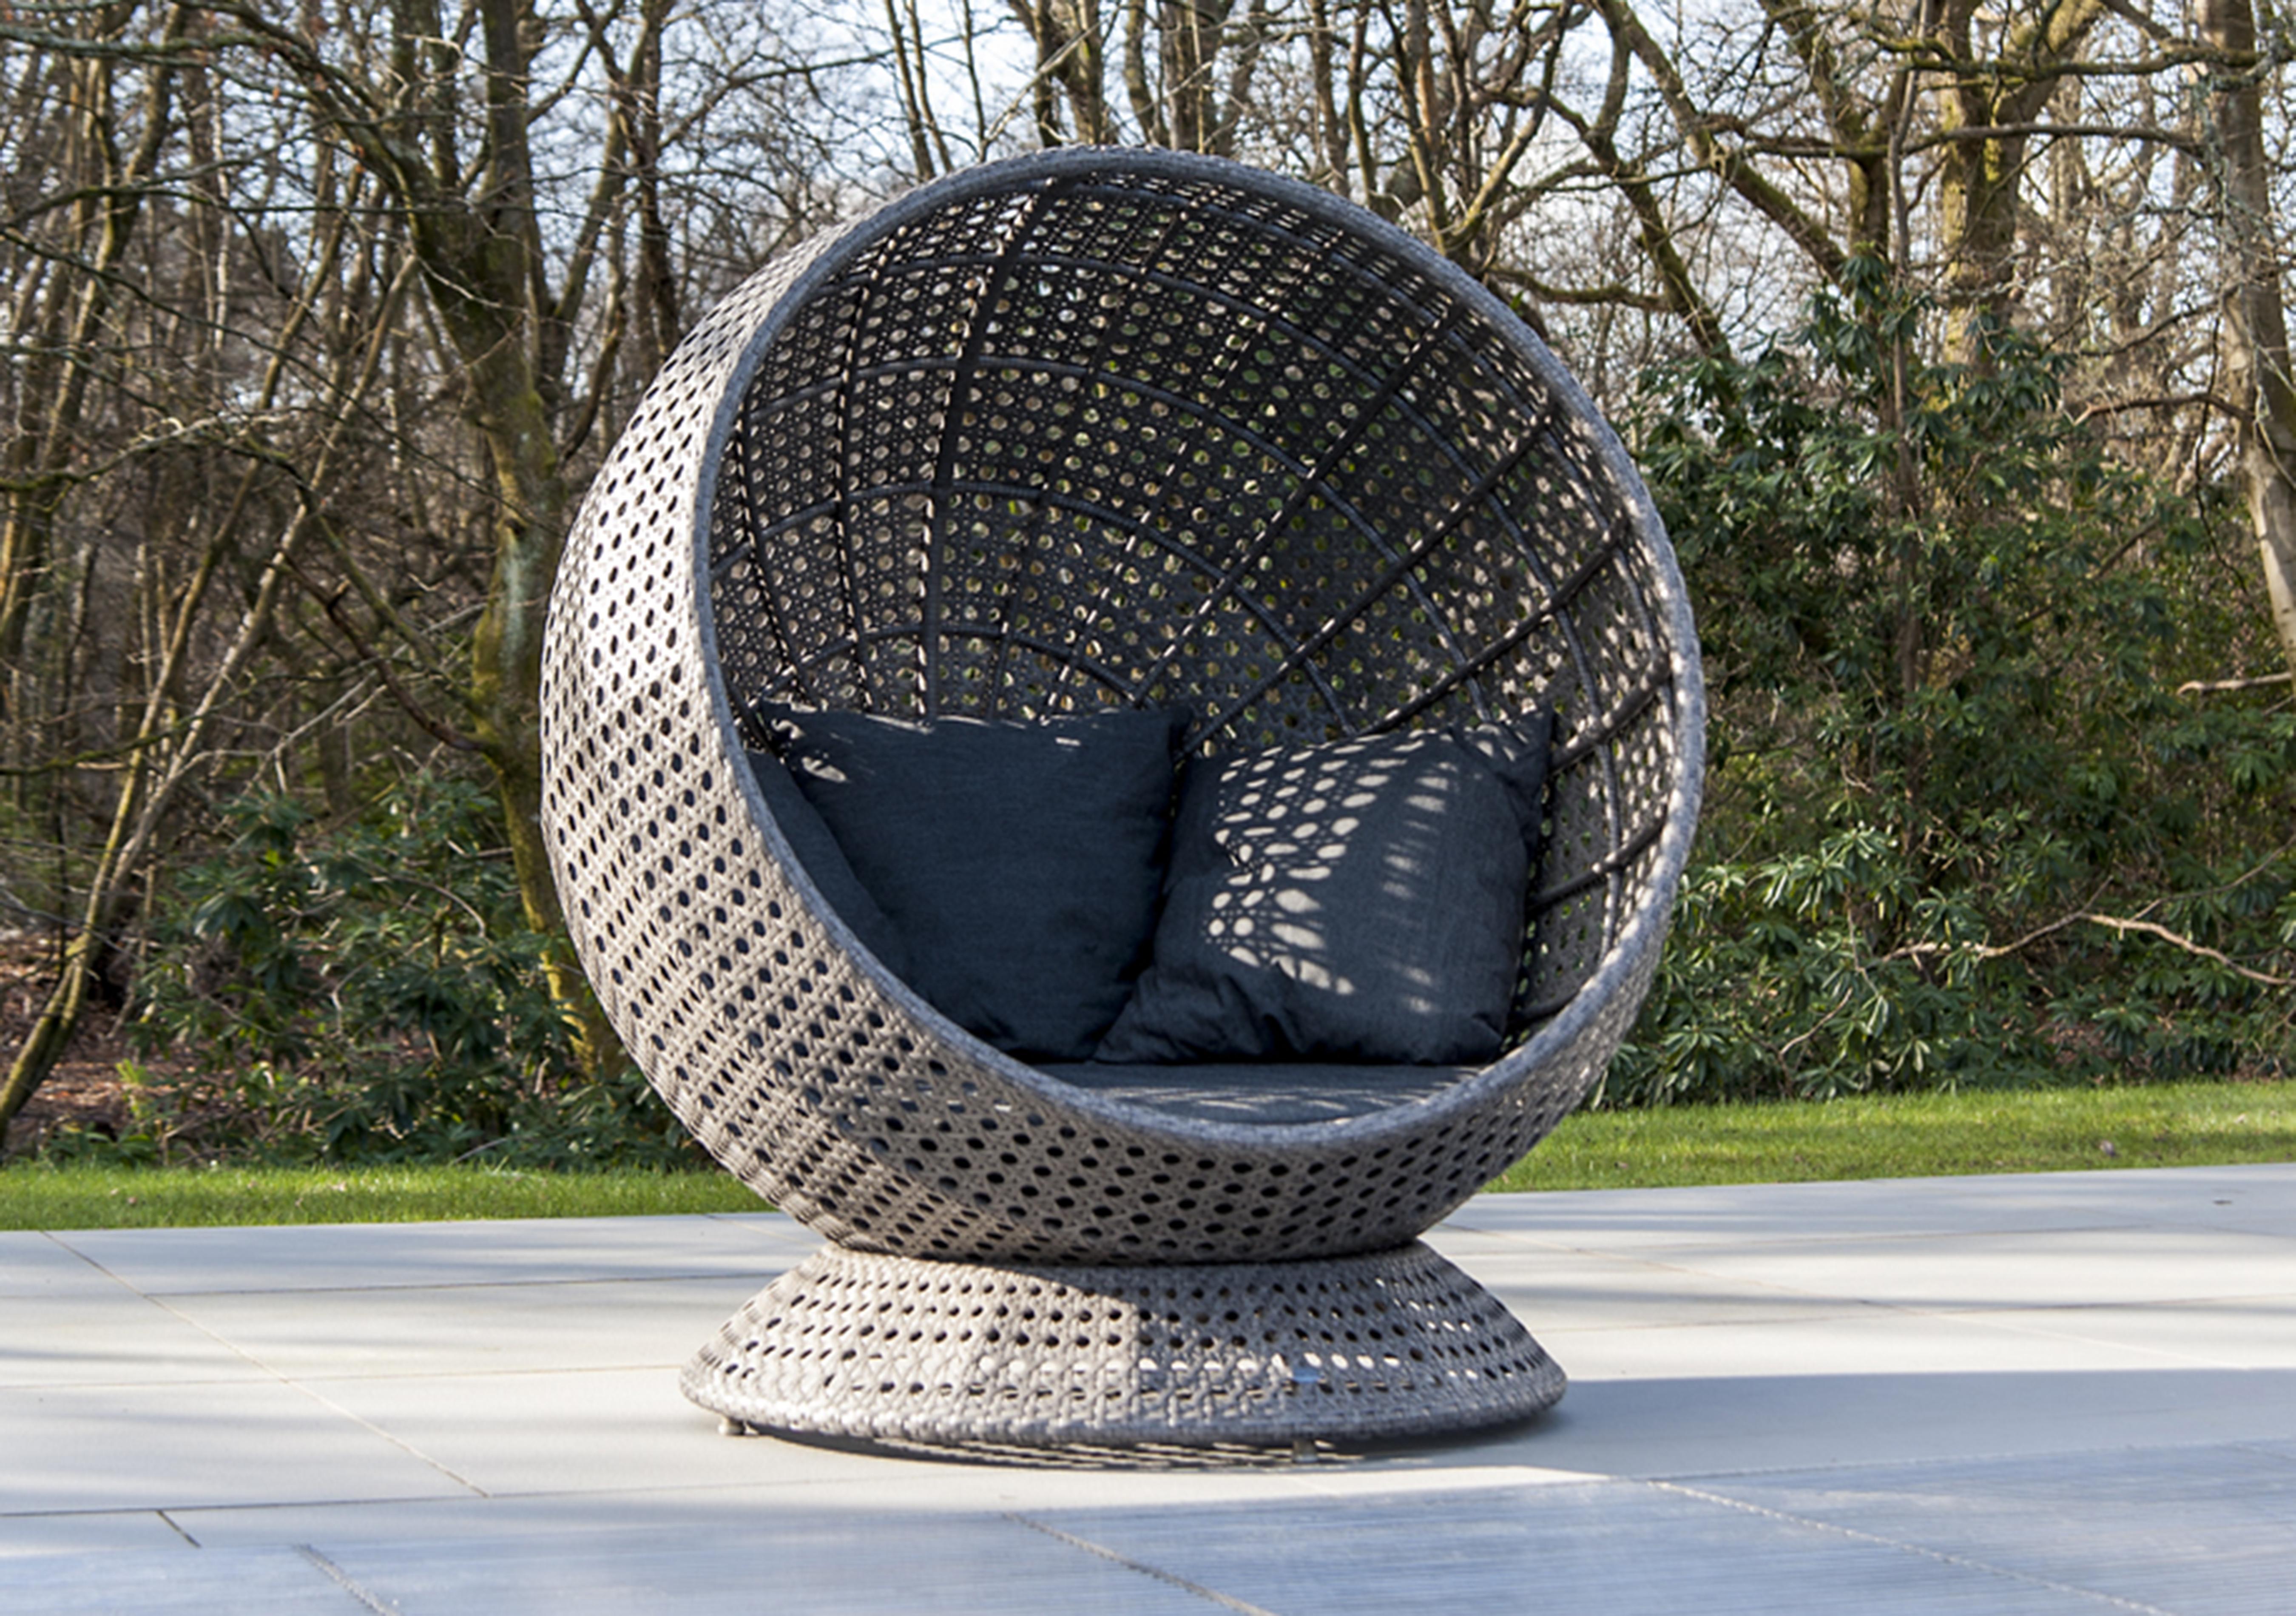 unique garden furniture pod collection in inspiration - Garden Furniture Pod